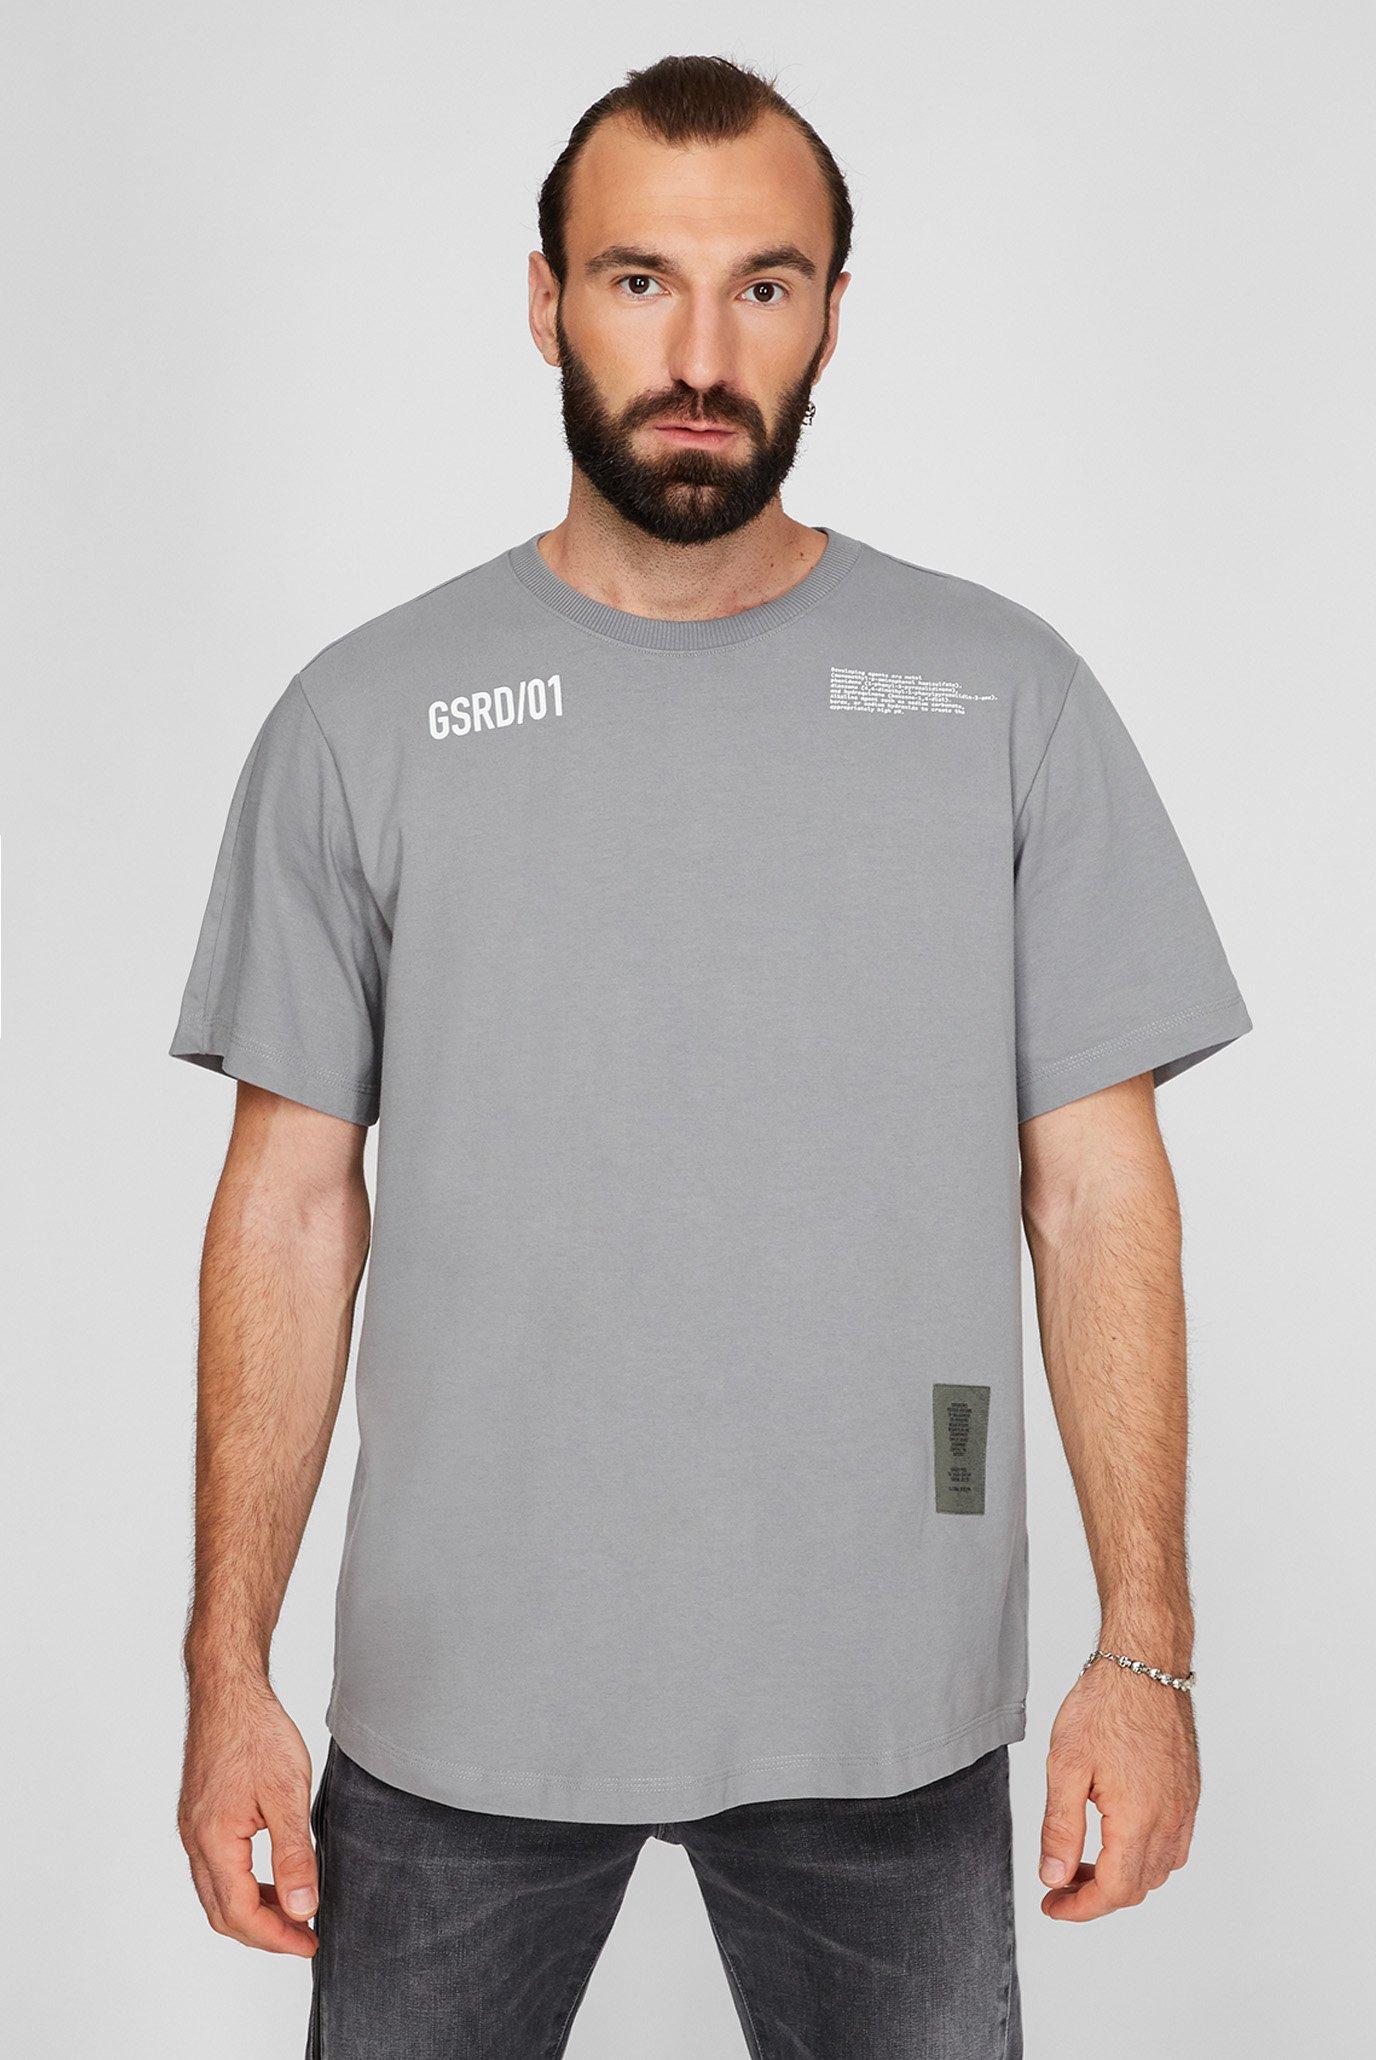 Чоловіча сіра футболка C & S back multi graphic loose t 1